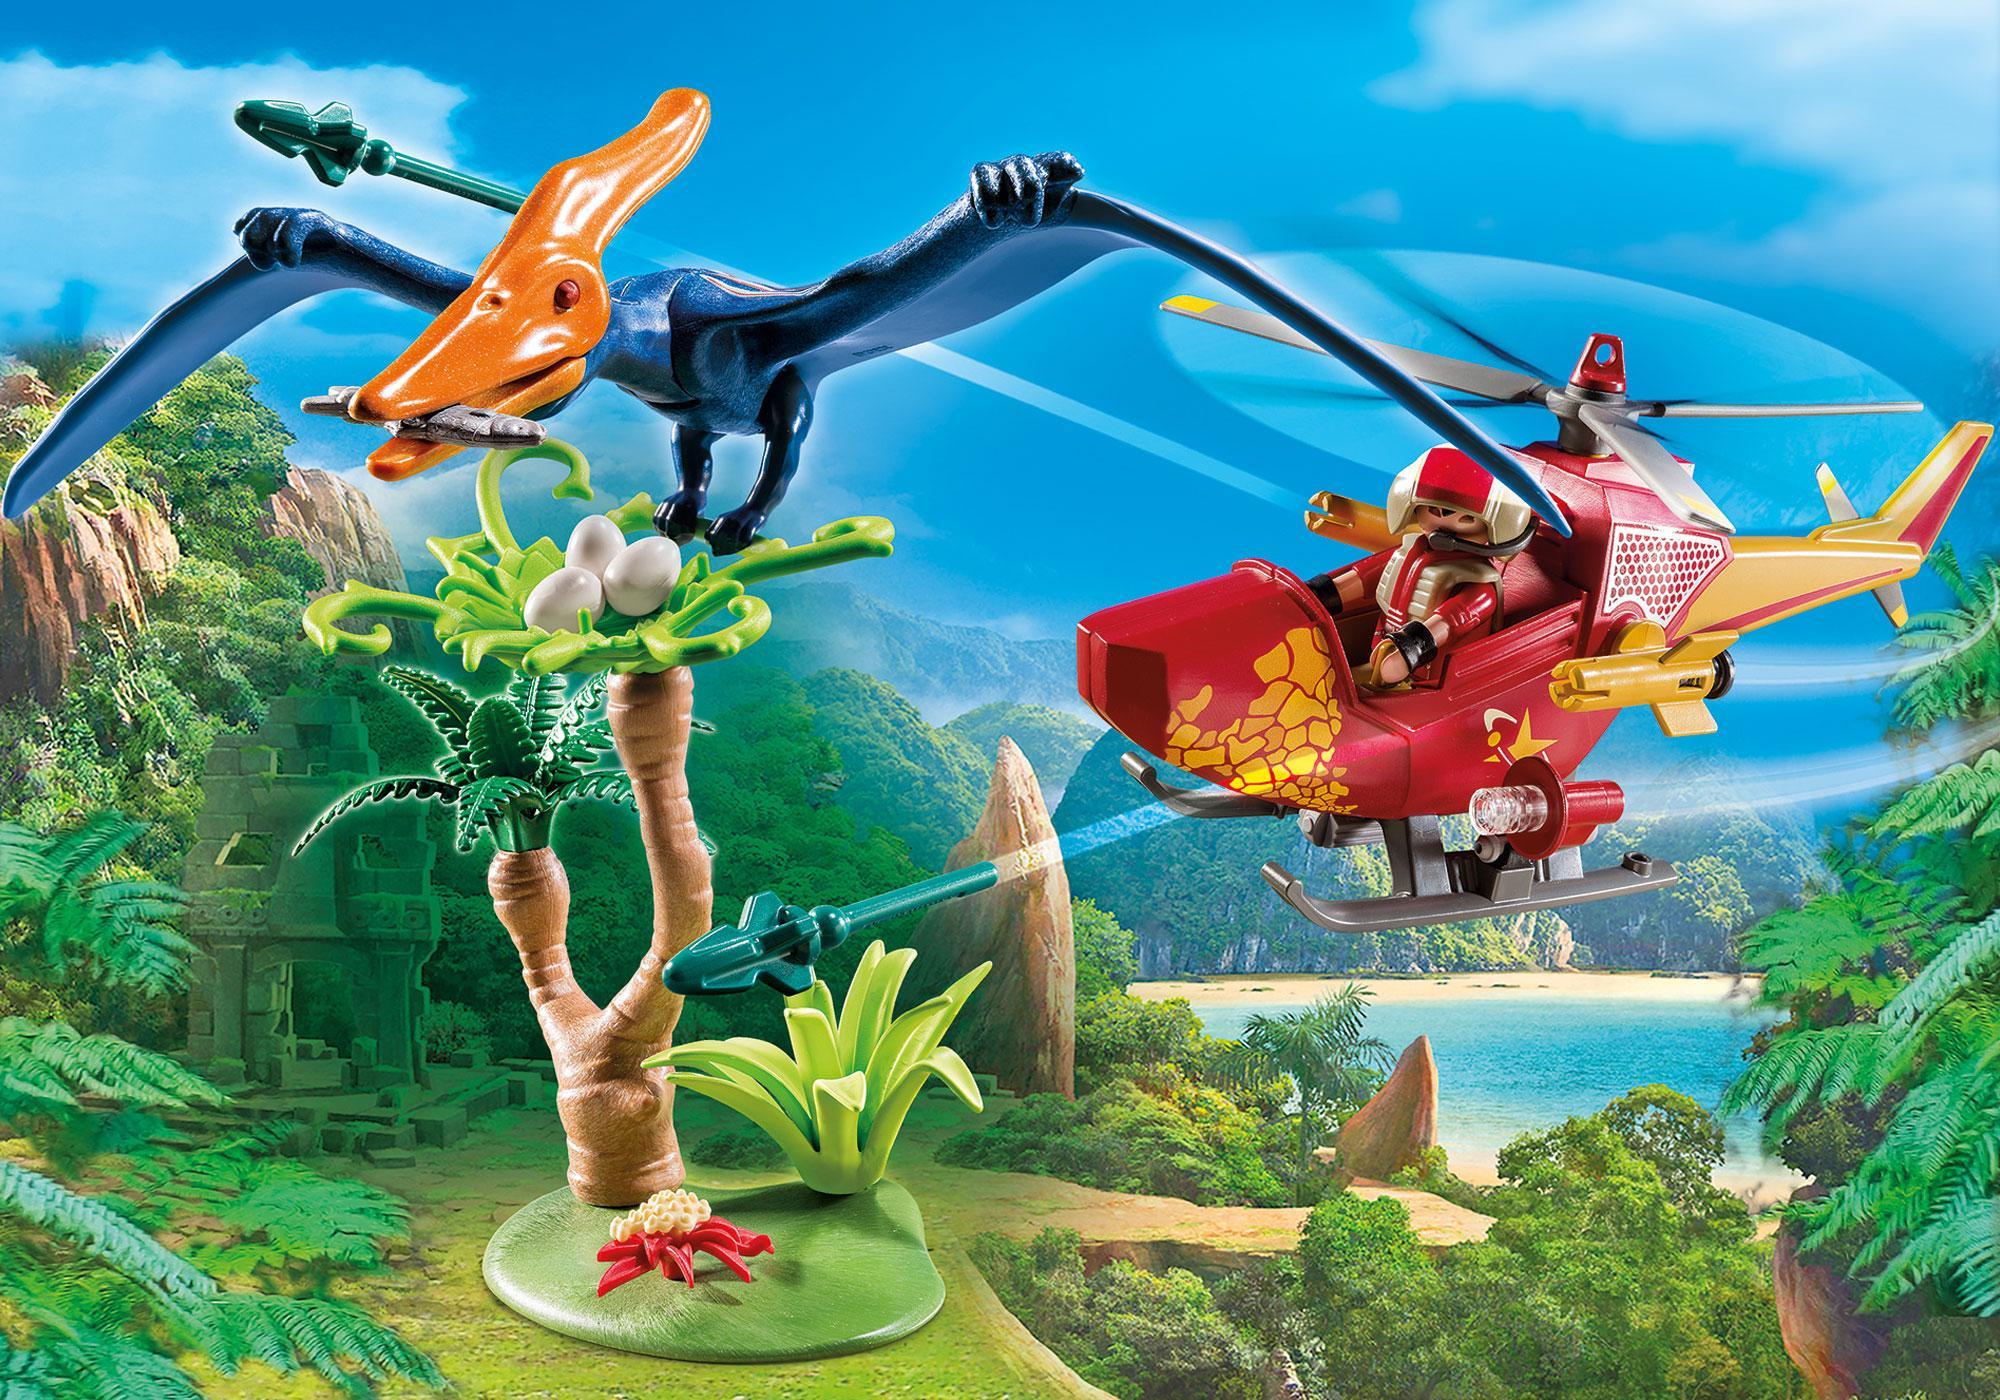 http://media.playmobil.com/i/playmobil/9430_product_detail/Ελικόπτερο και Πτεροδάκτυλος